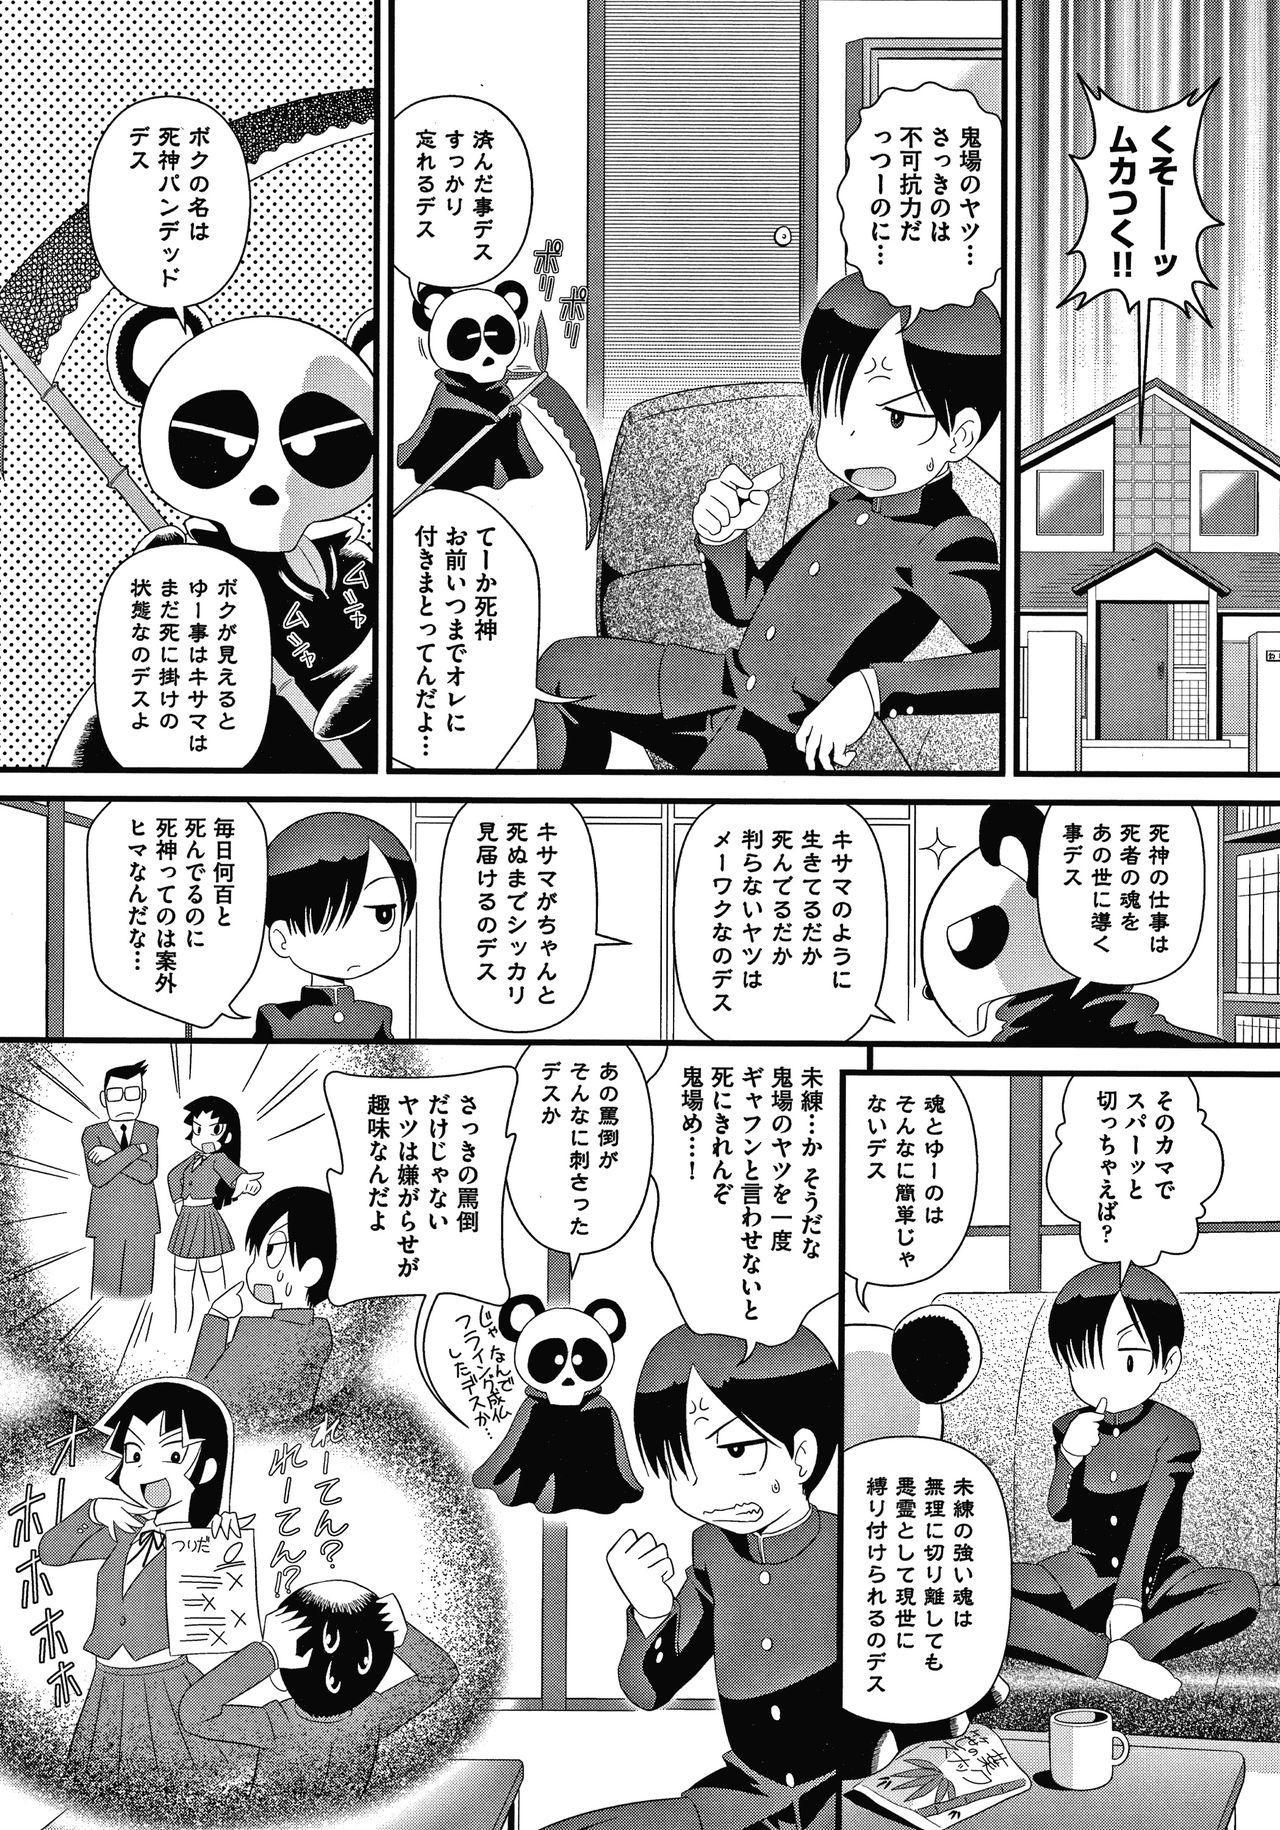 Shoujo Kumikyoku 15 8